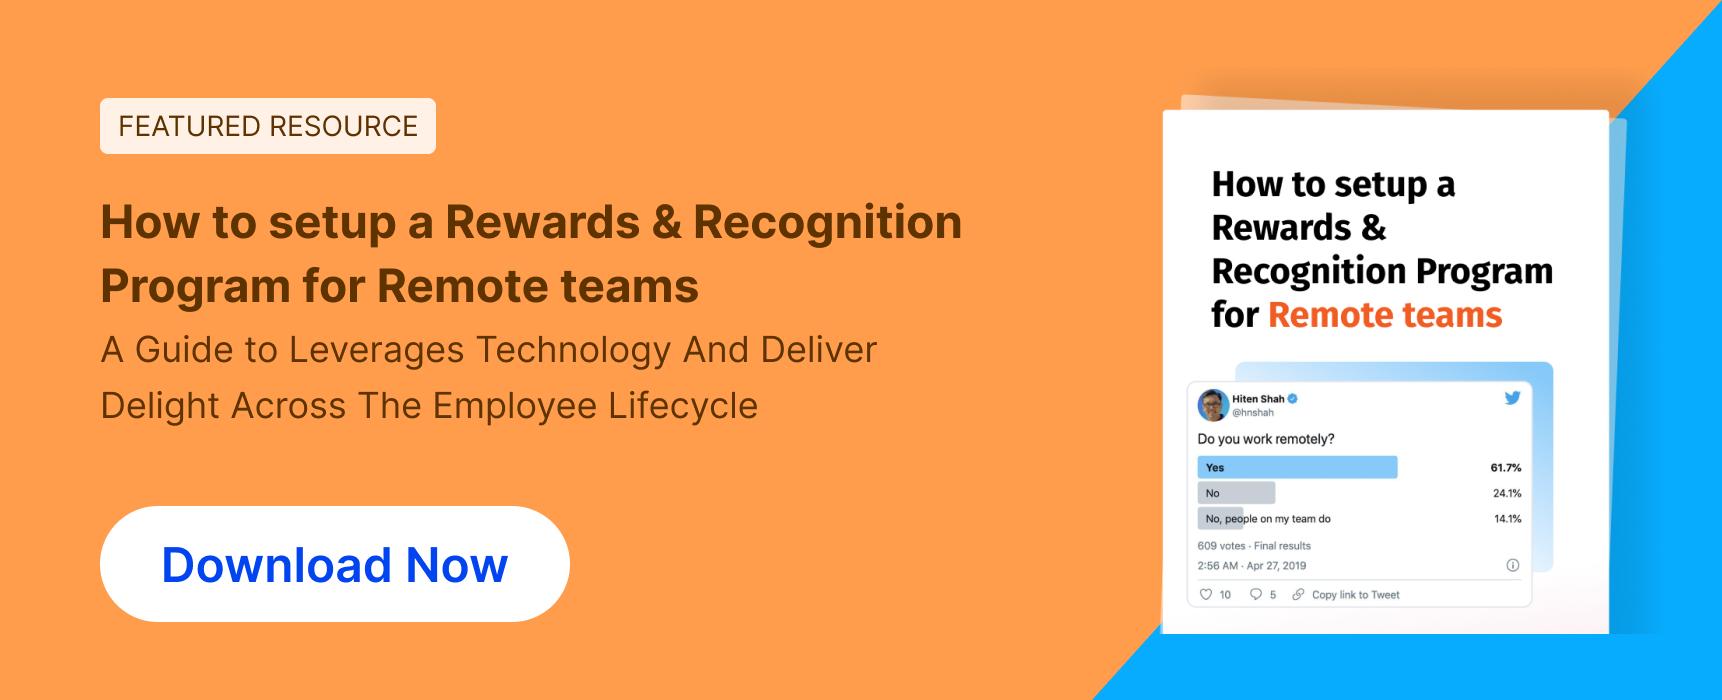 Rewards & Recognition Program